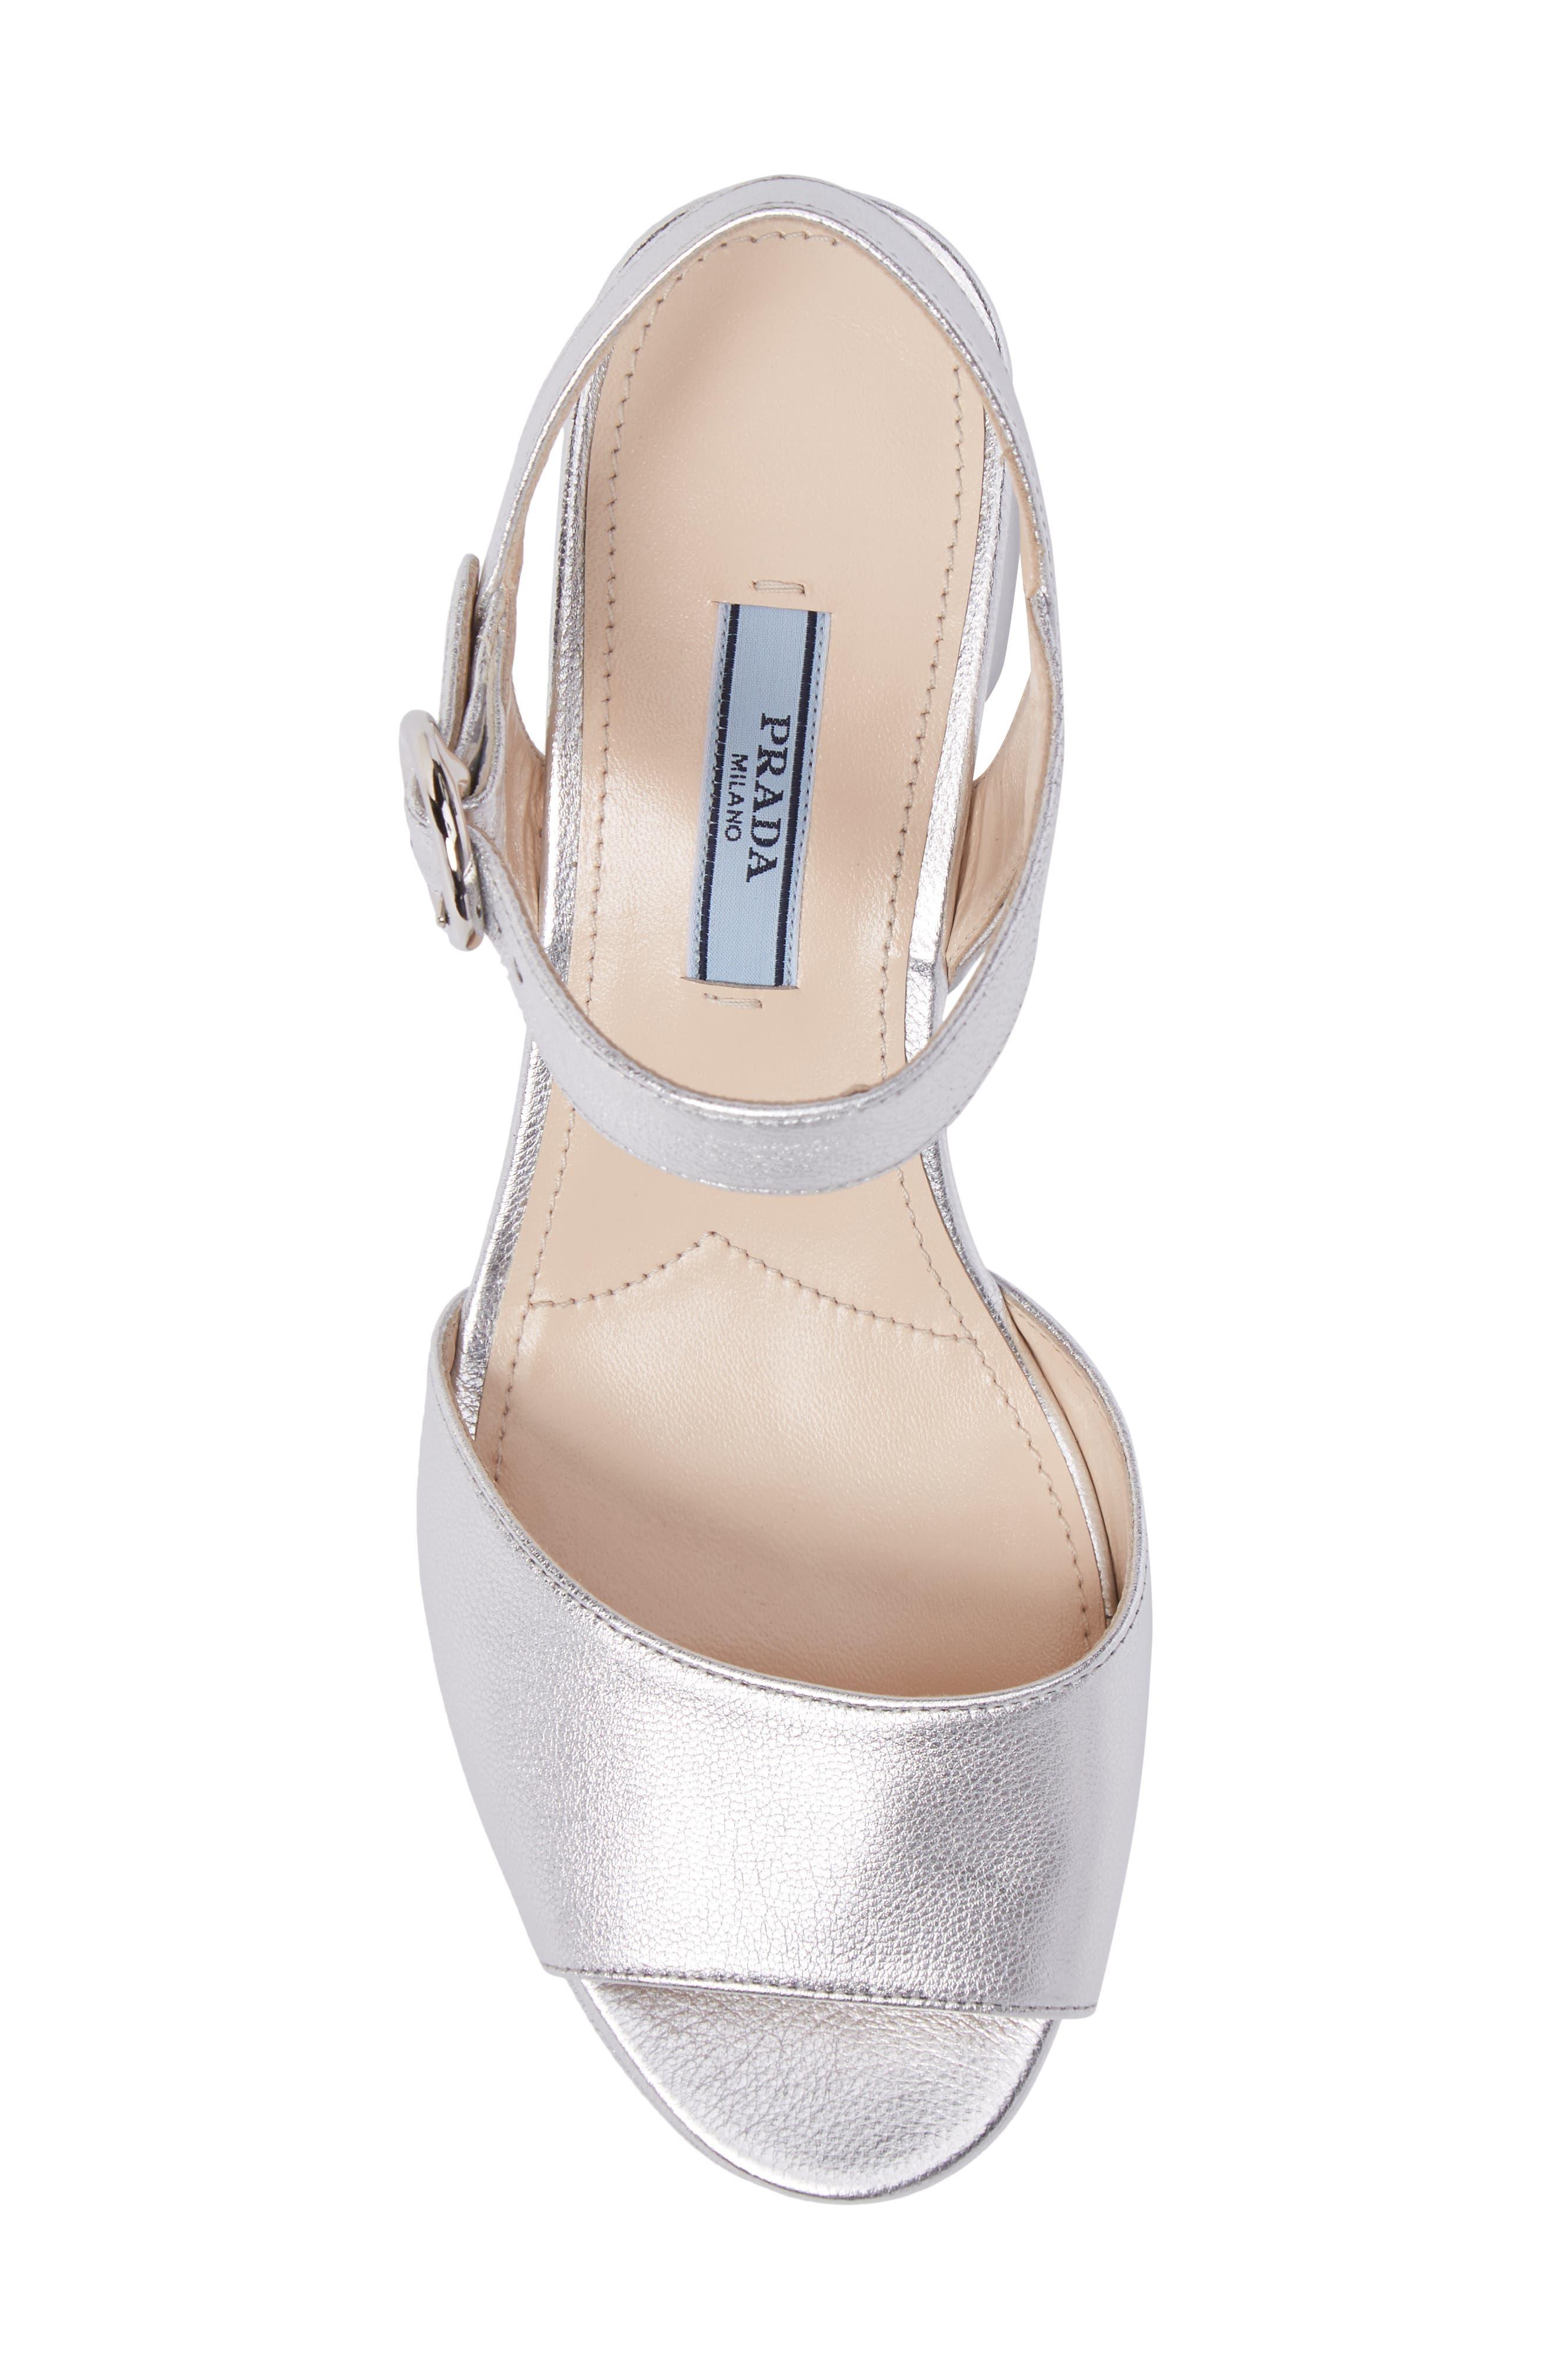 Ankle Strap Platform Sandal,                             Alternate thumbnail 5, color,                             040